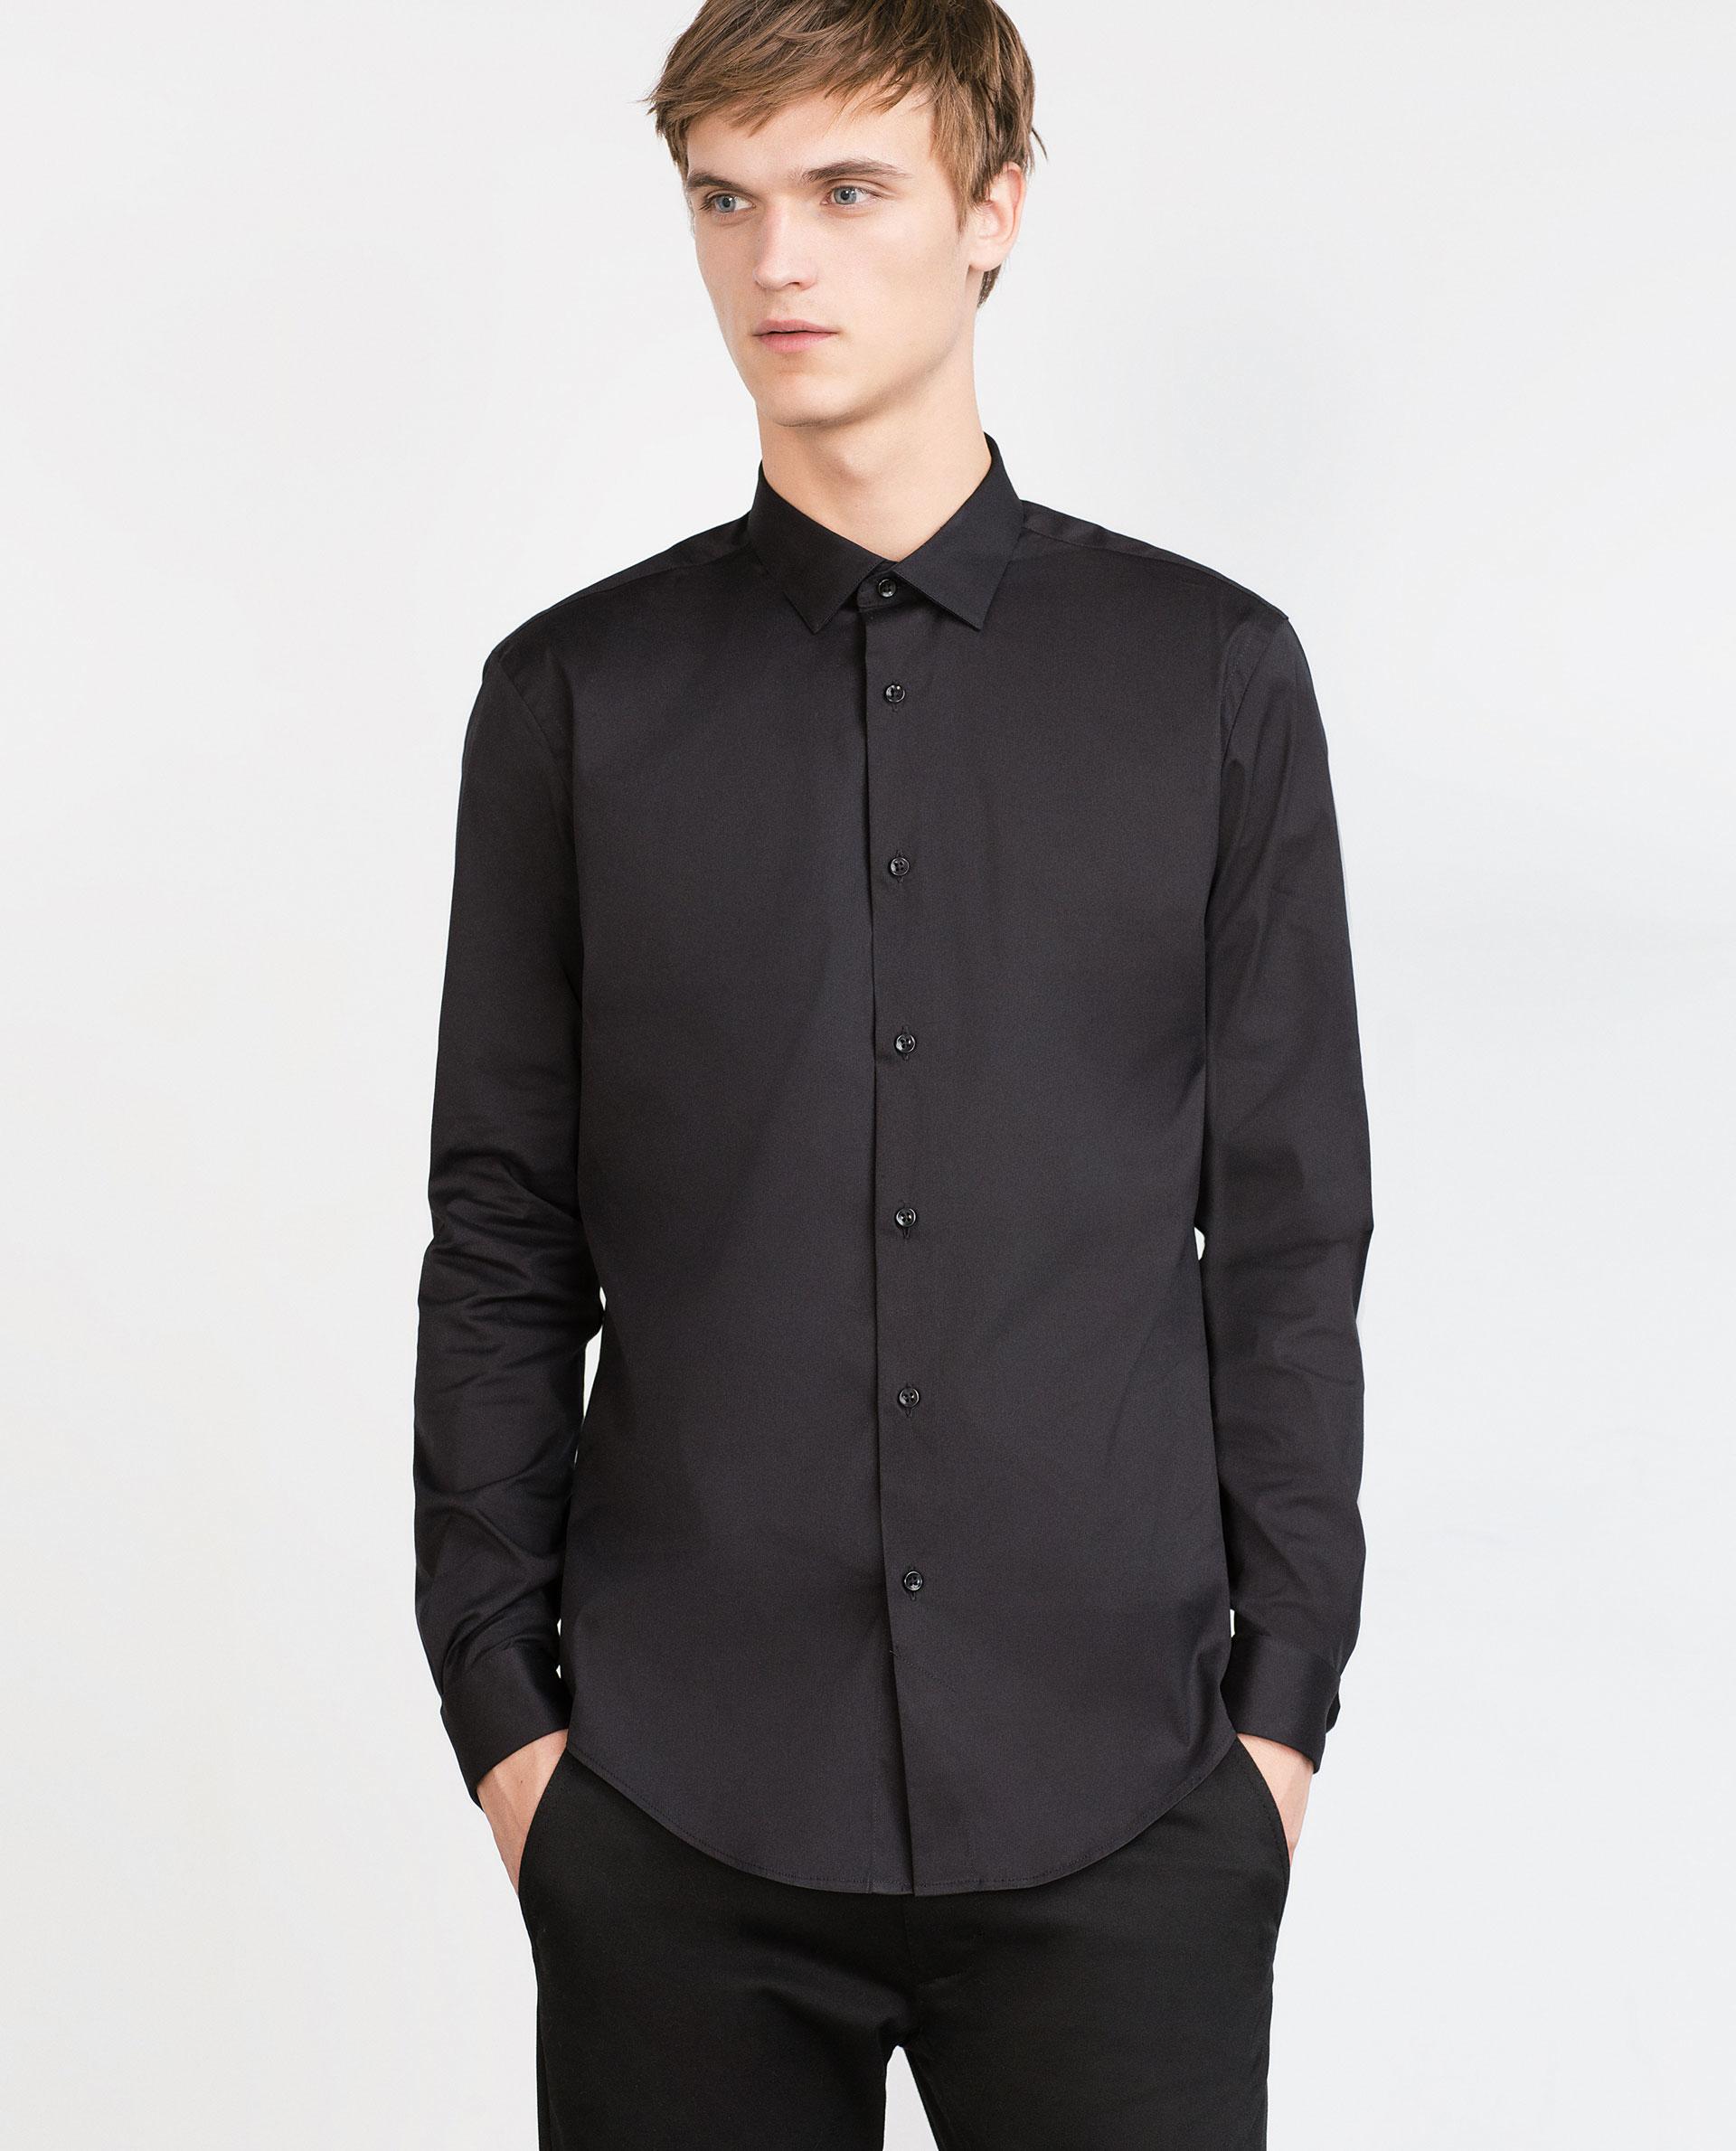 Zara stretch shirt in black for men lyst for Zara mens shirts sale